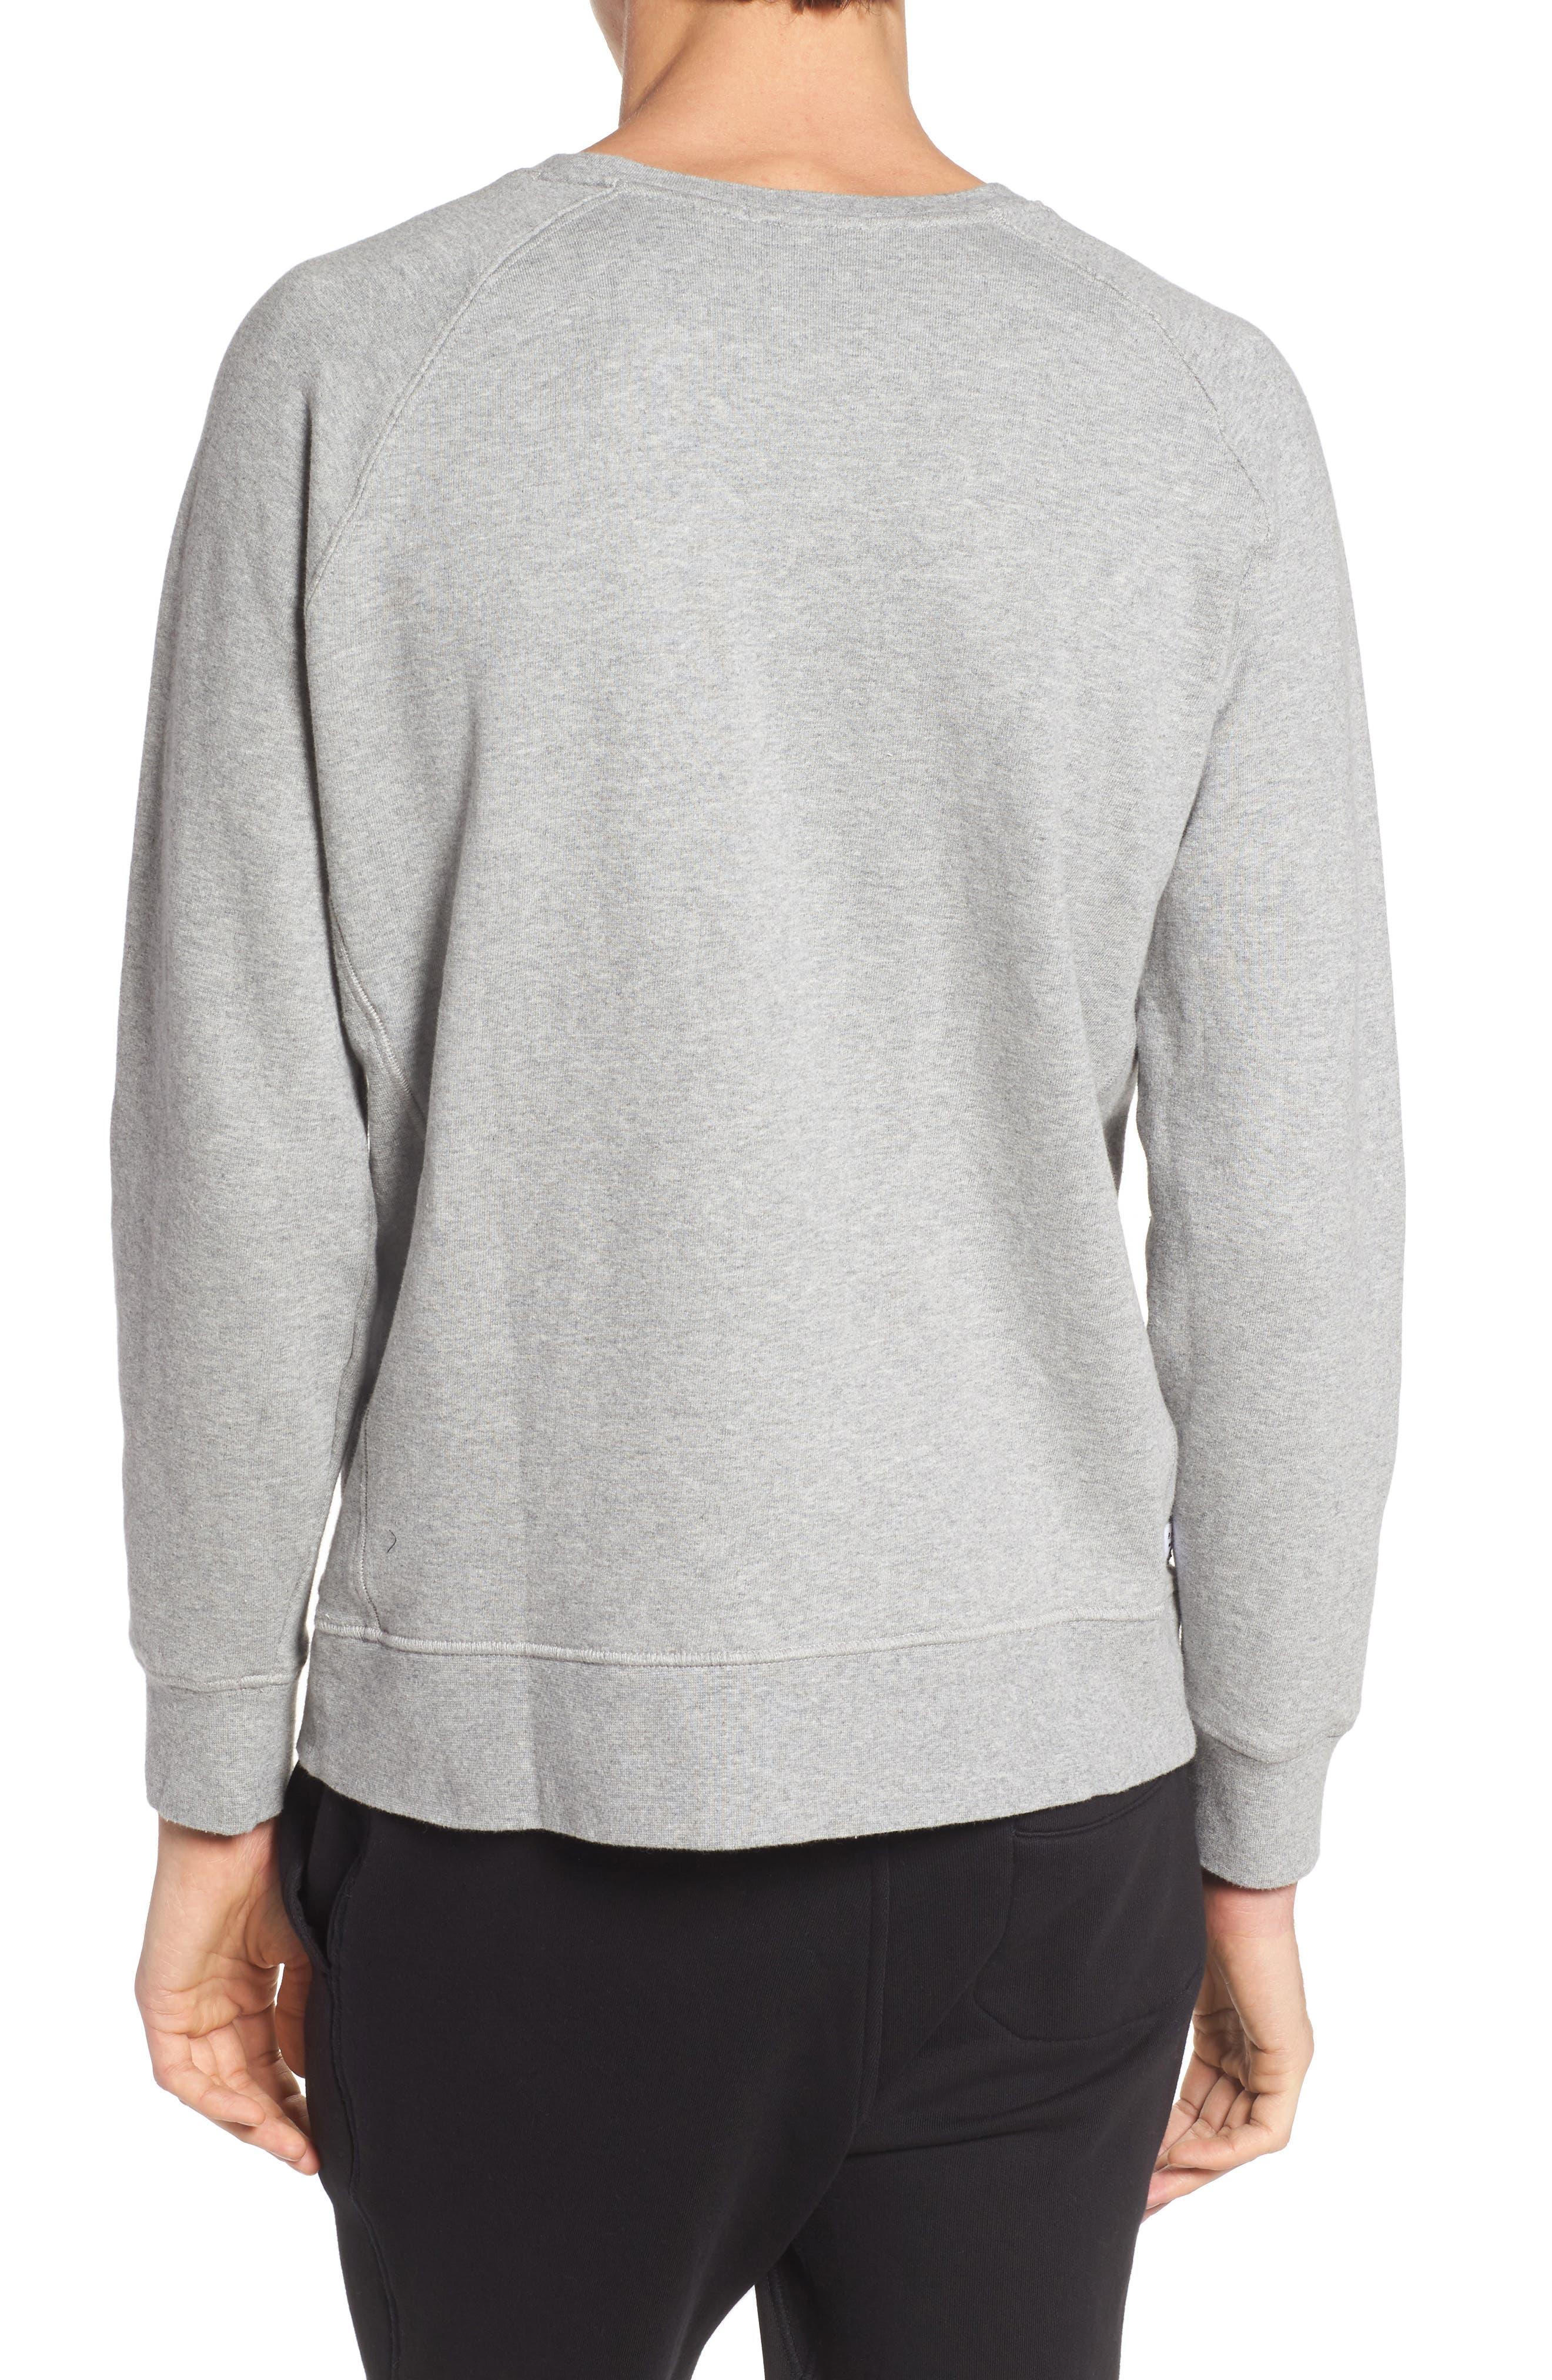 Alternate Image 2  - Richer Poorer Lounge Crewneck Sweatshirt